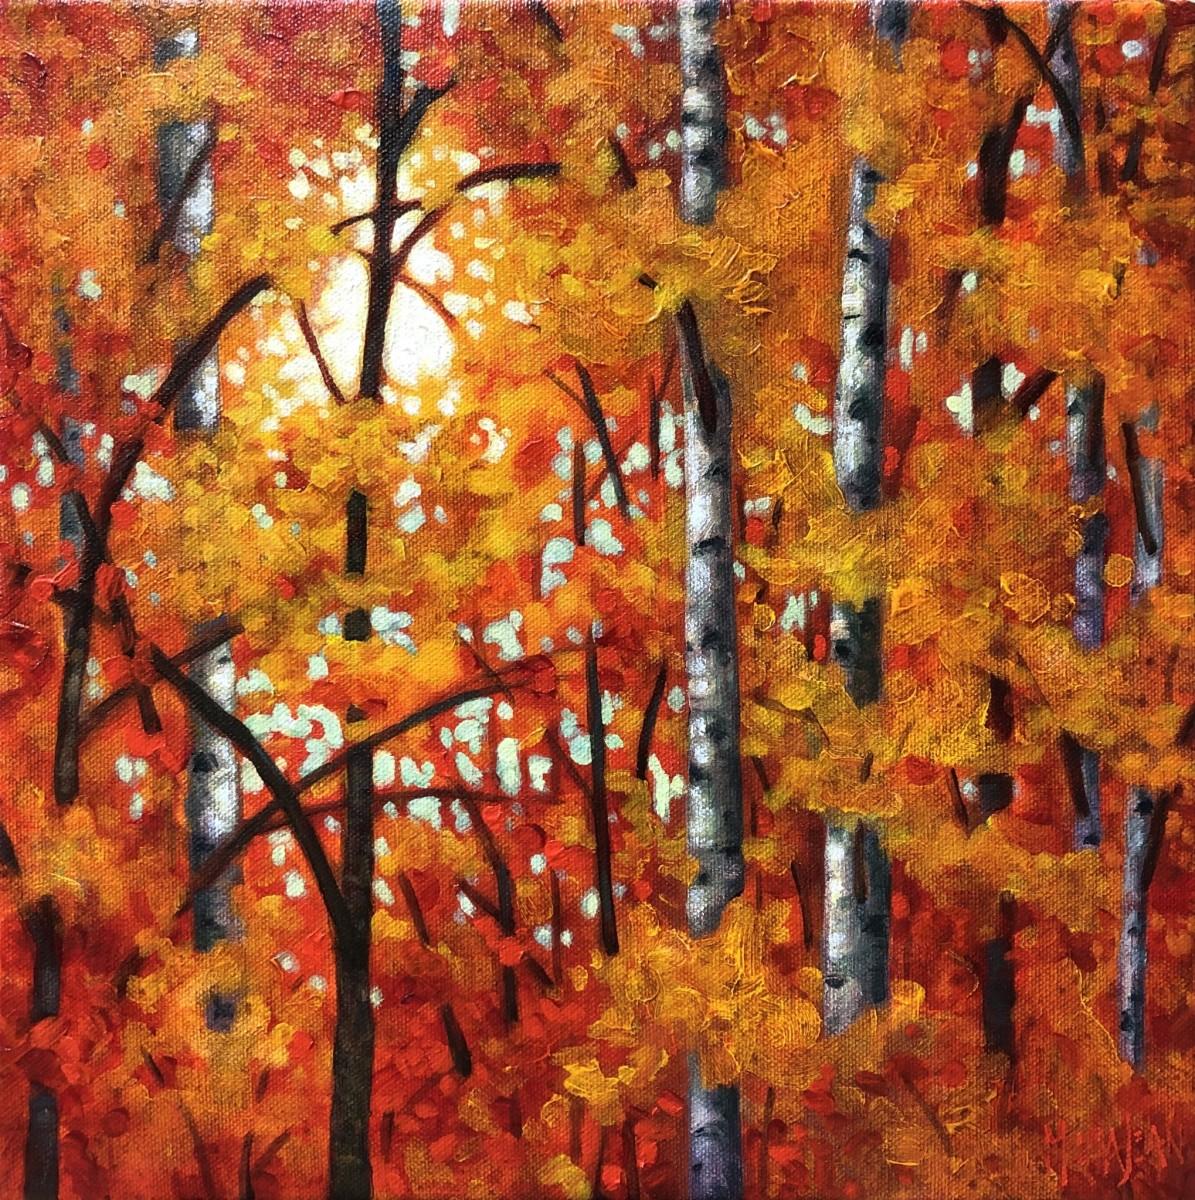 Autumn Pattern by Melissa Jean